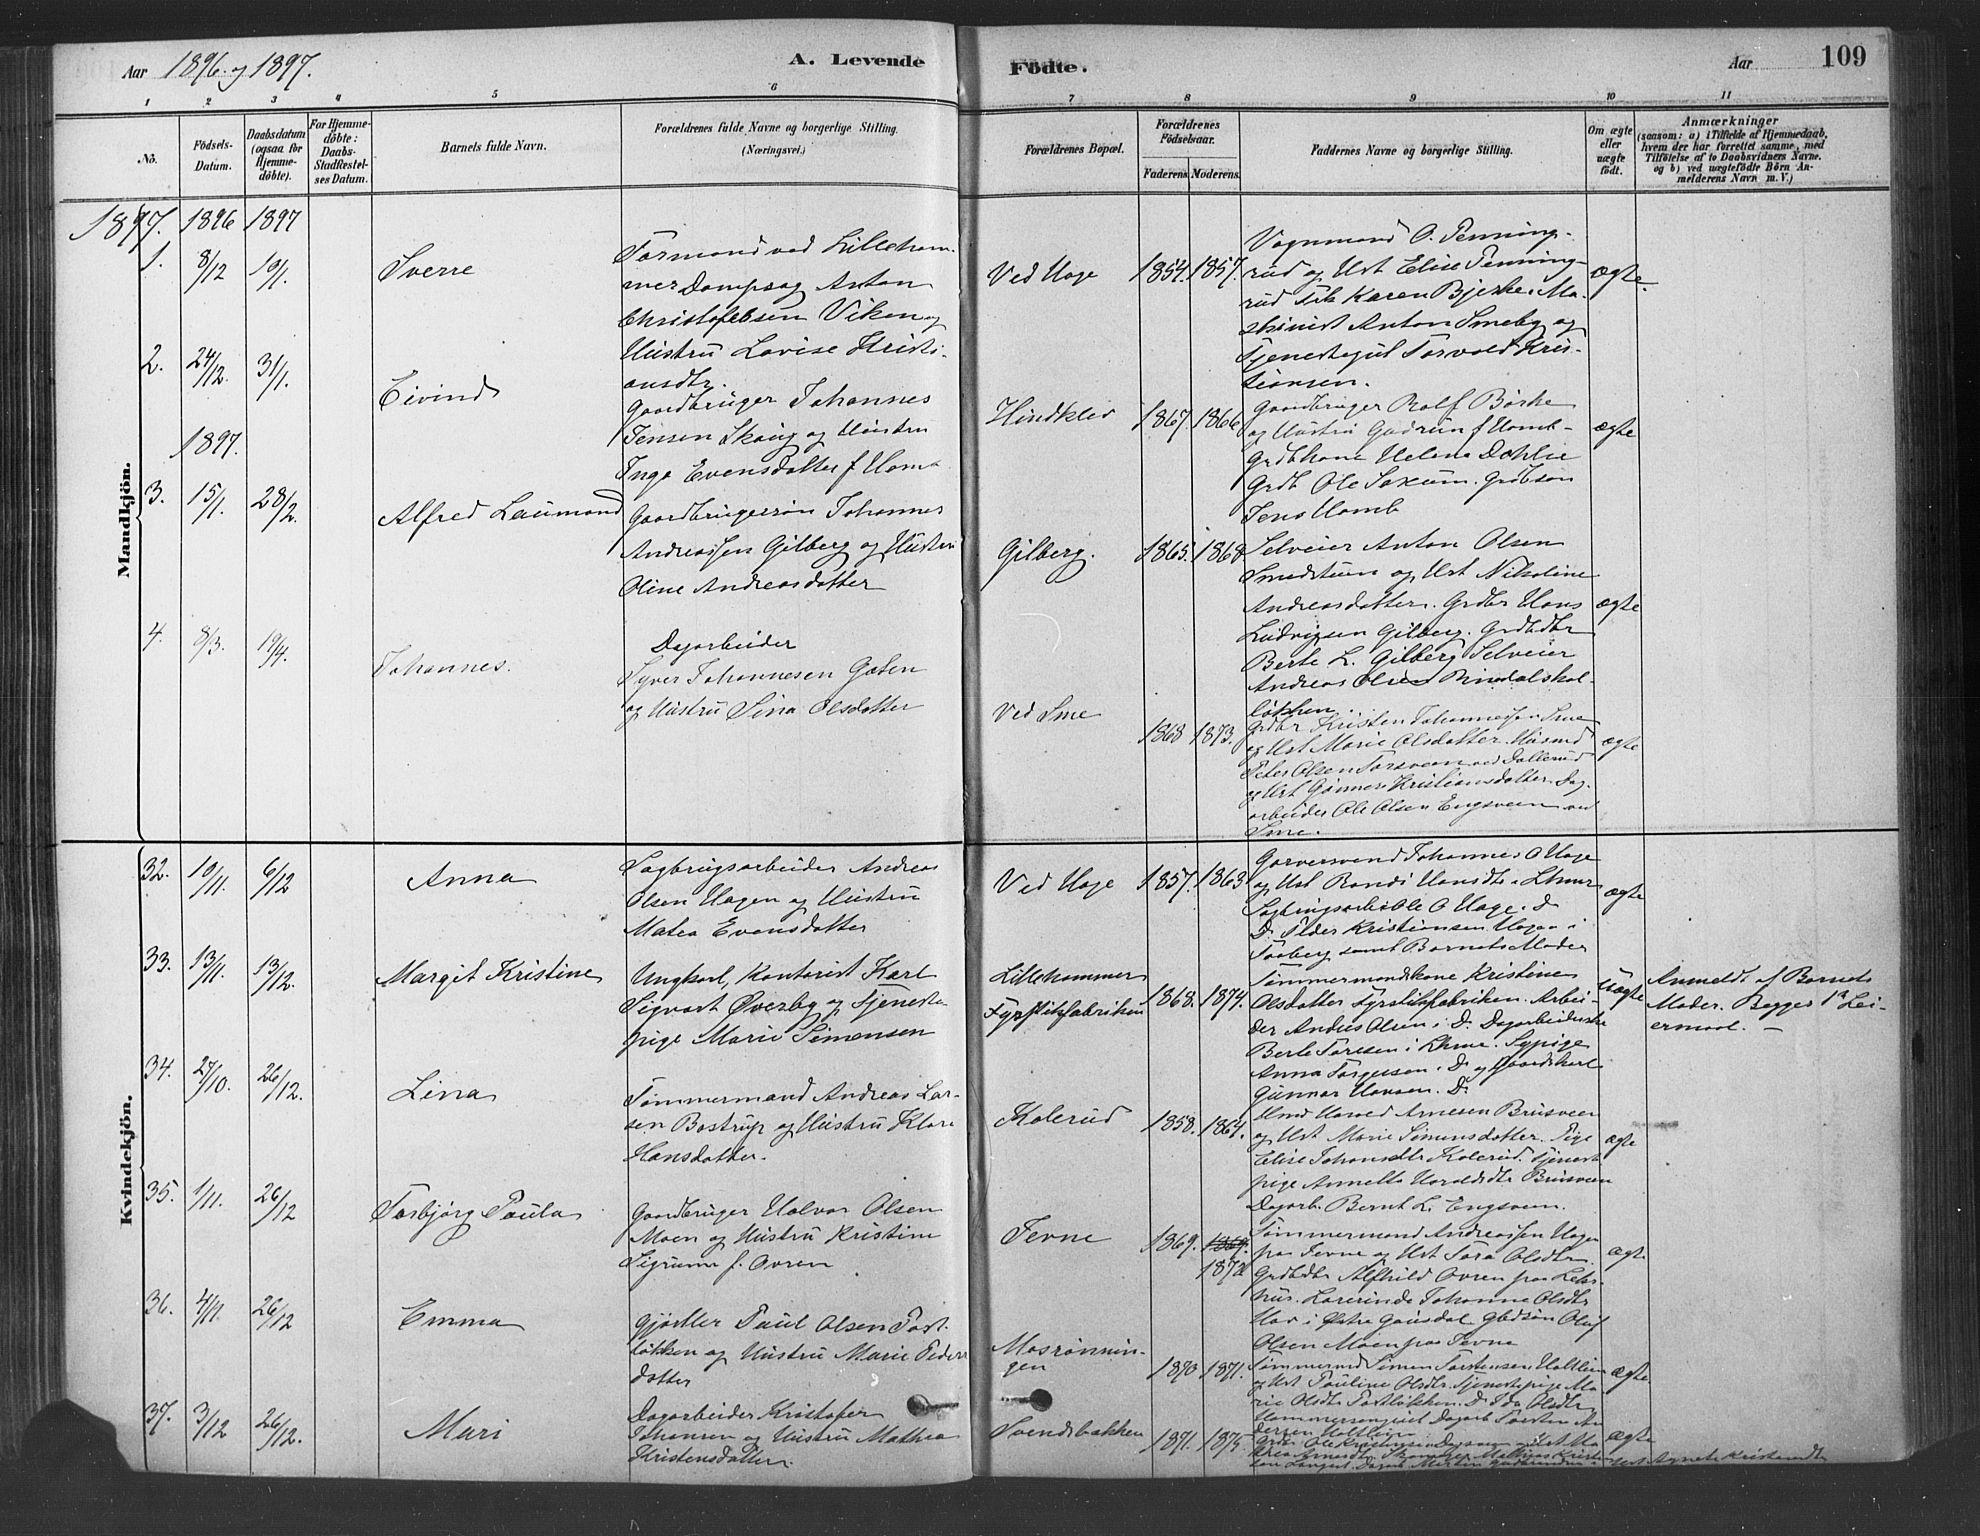 SAH, Fåberg prestekontor, Ministerialbok nr. 9, 1879-1898, s. 109